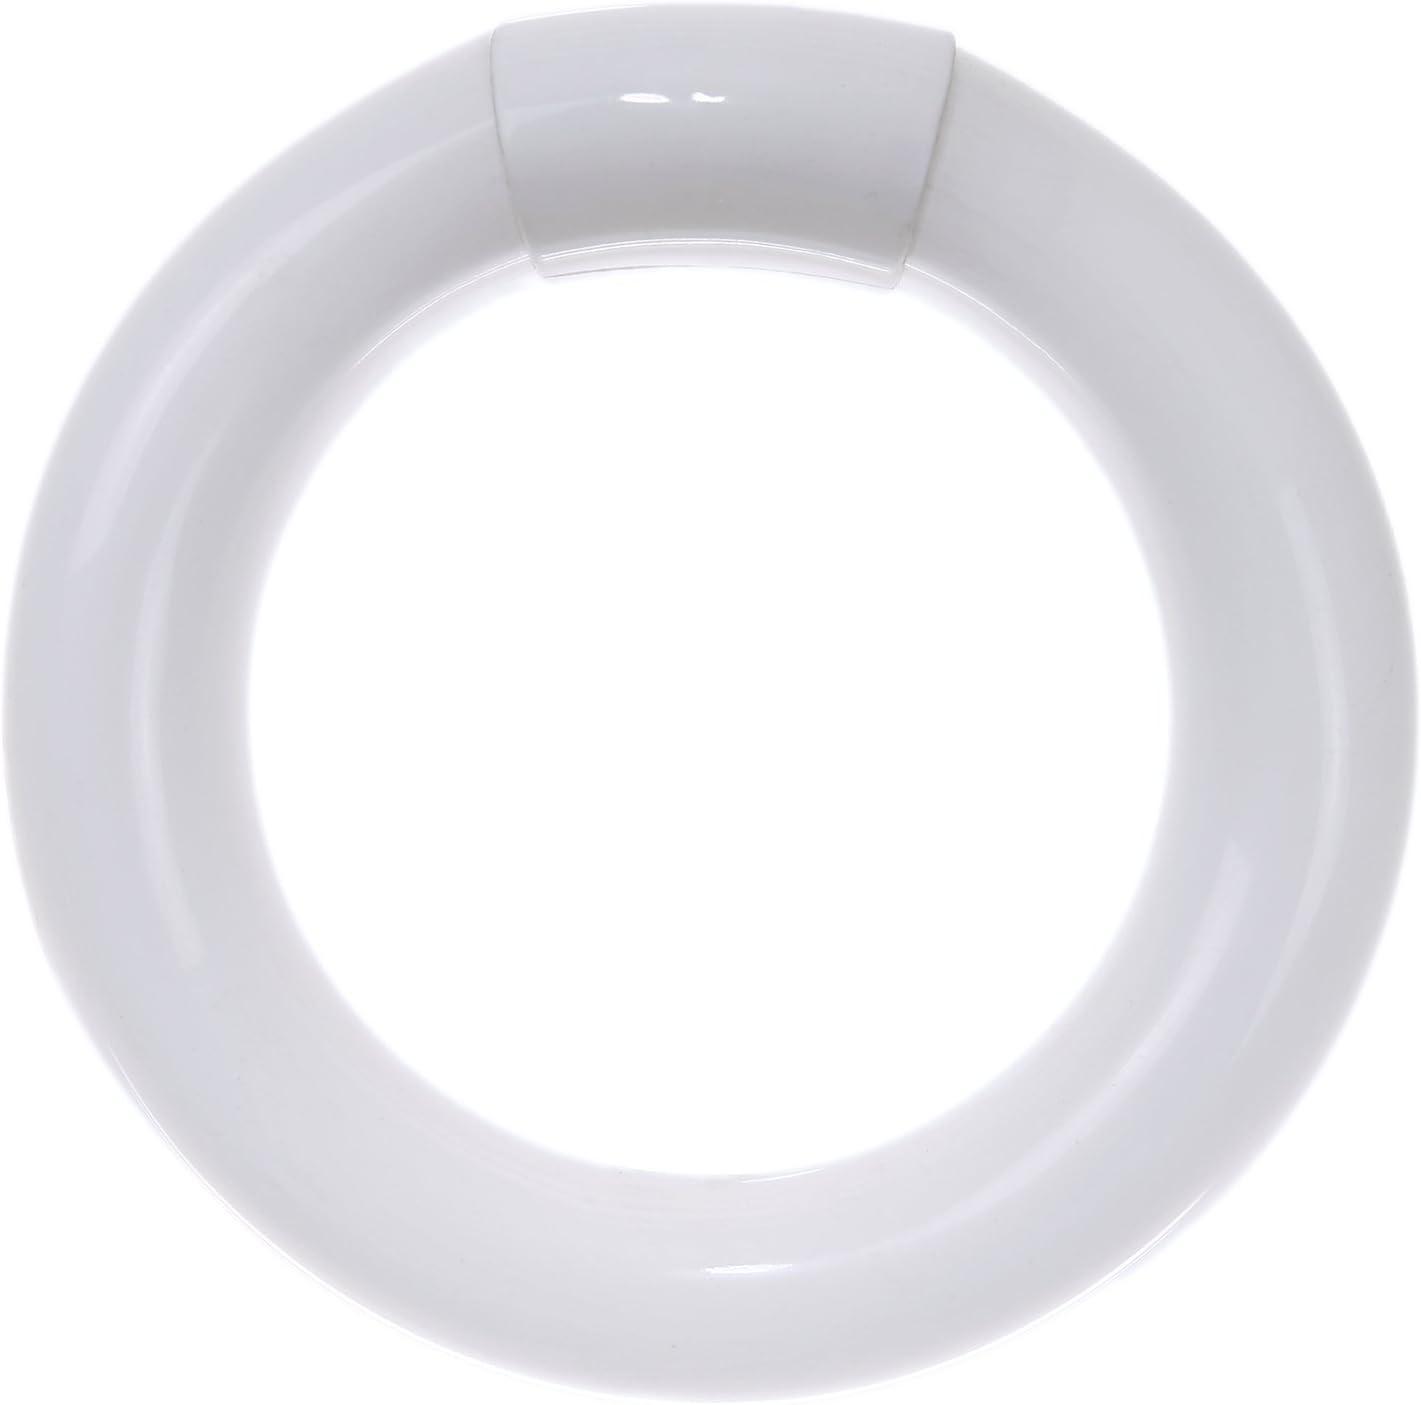 Sunlite FC8T9/WW Fluorescent 22W T9 Circline Ceiling Lights, 3000K Warm White Light, 4-Pin Base